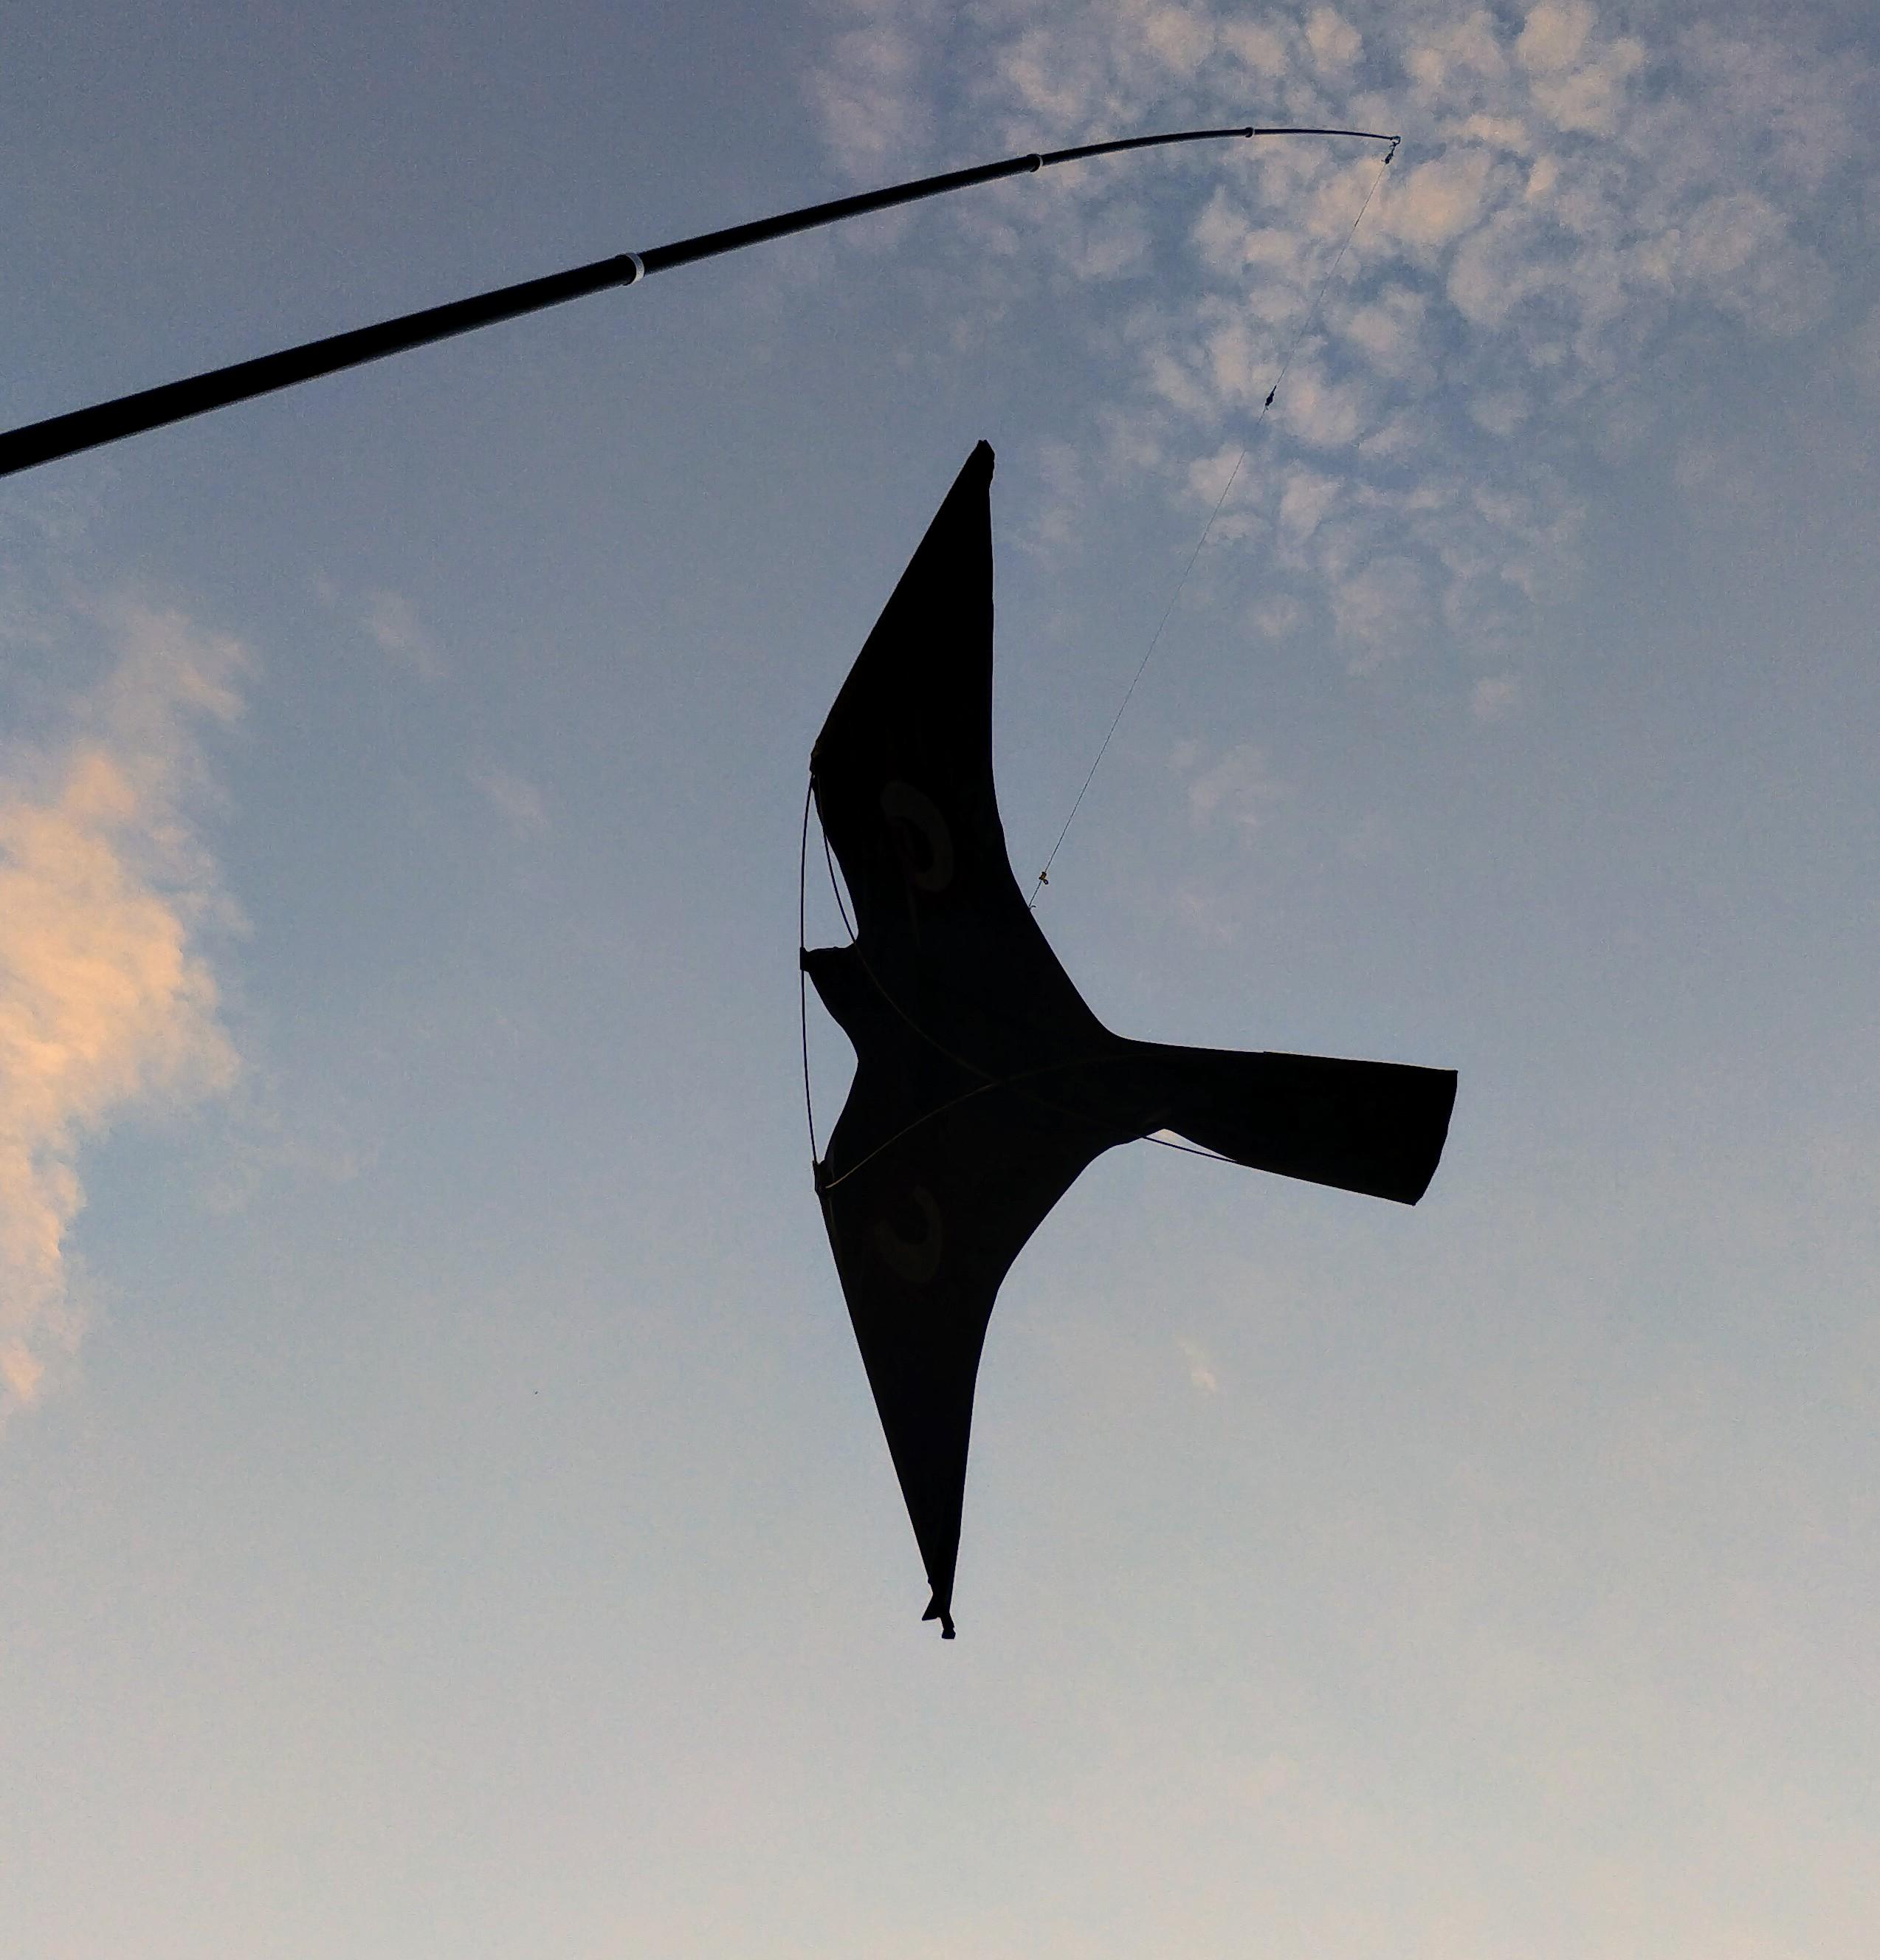 bird repellent kite